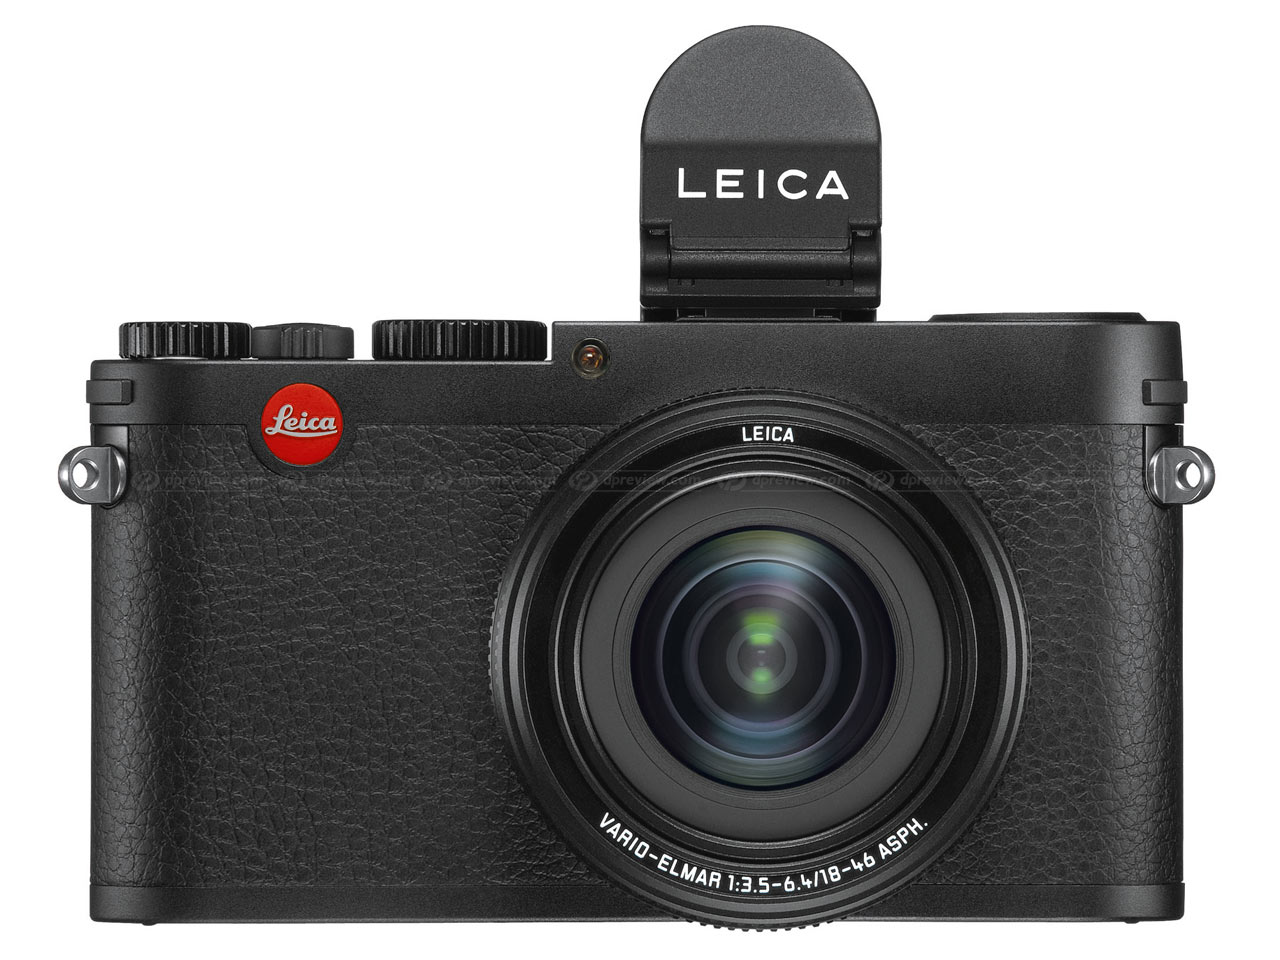 Leica Announces X Vario Zoom Compact With Aps C Sensor Digital Ricoh Strap St 3 W Additional Images